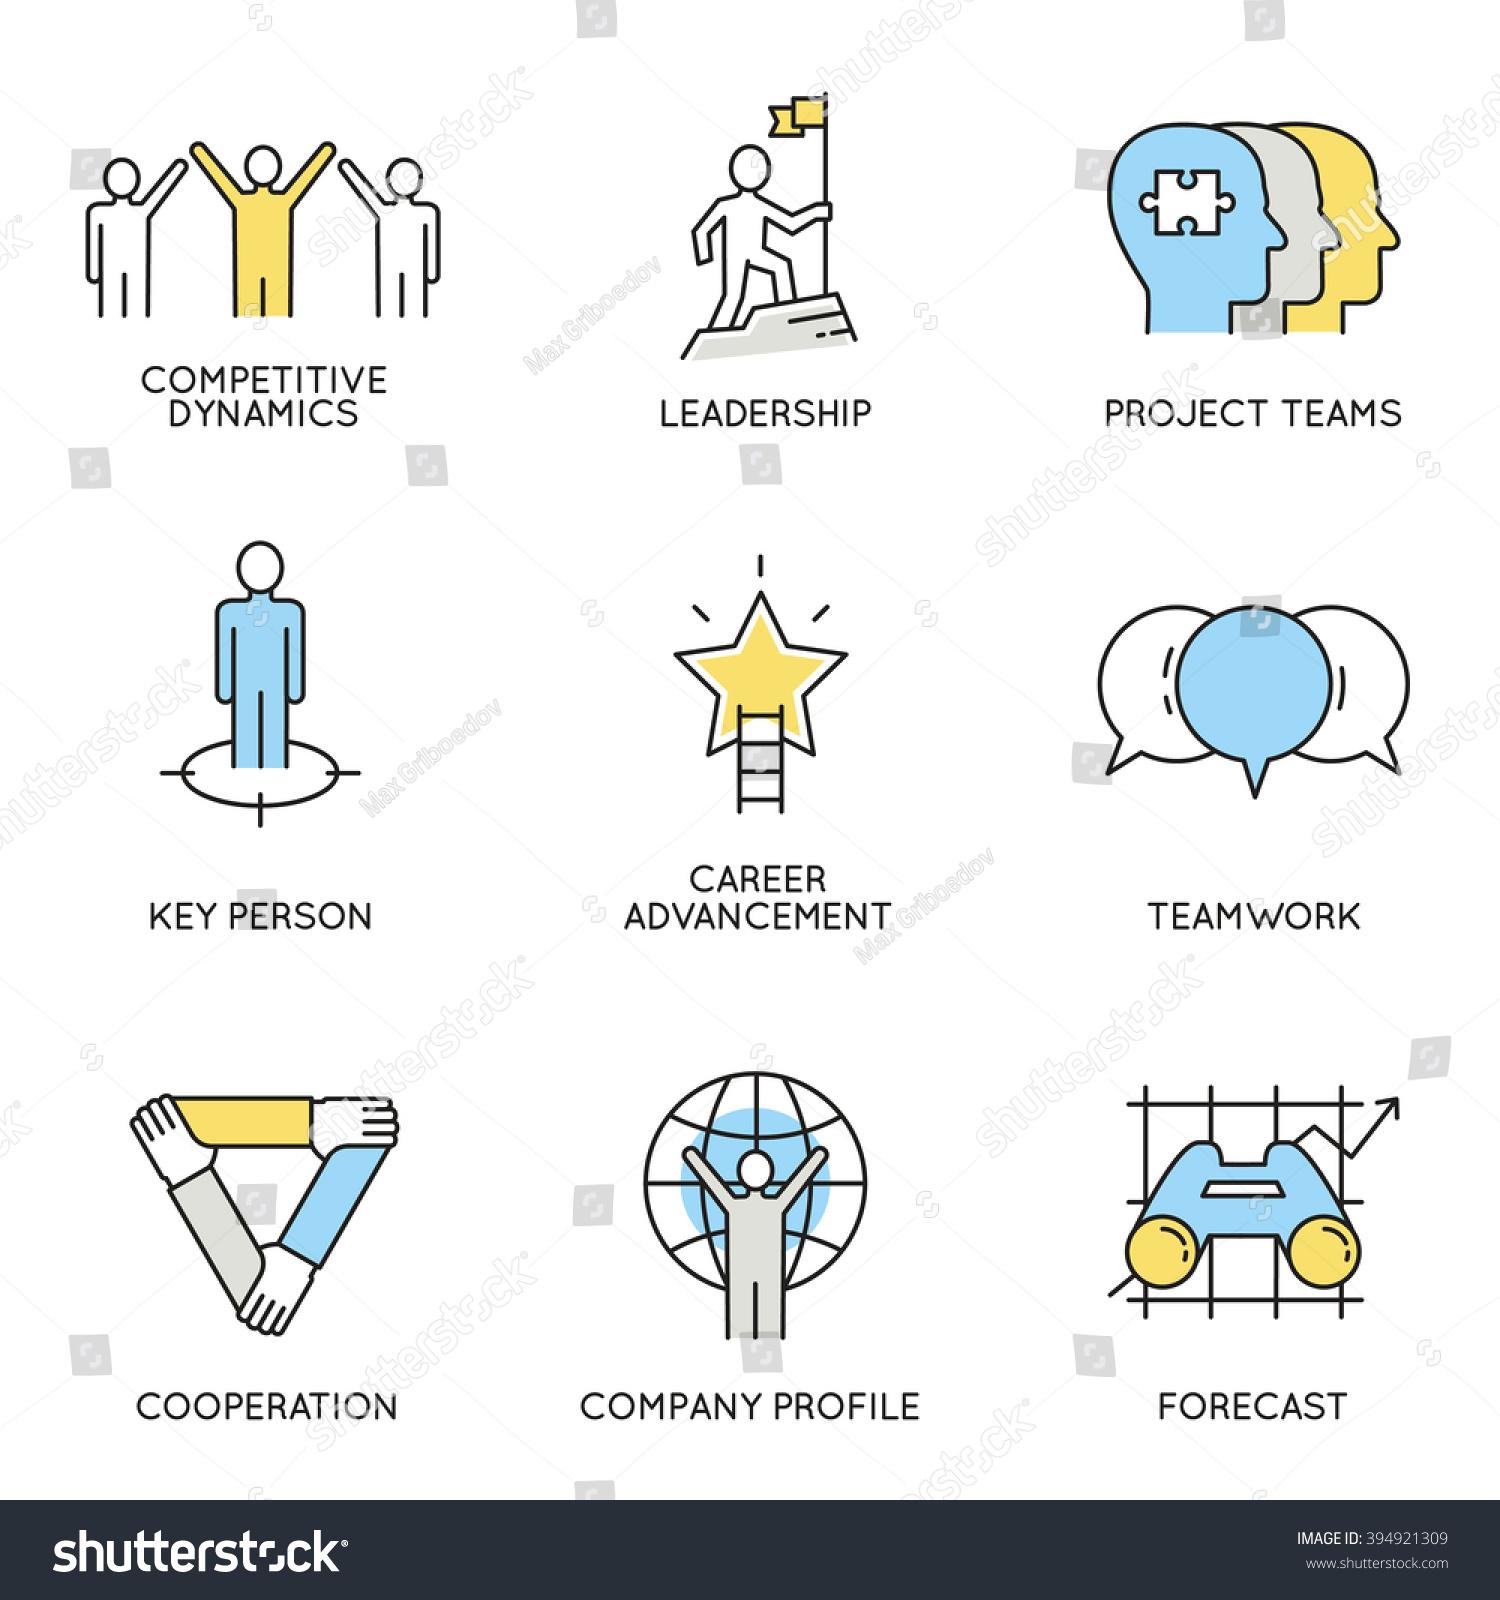 employee and customer relationship